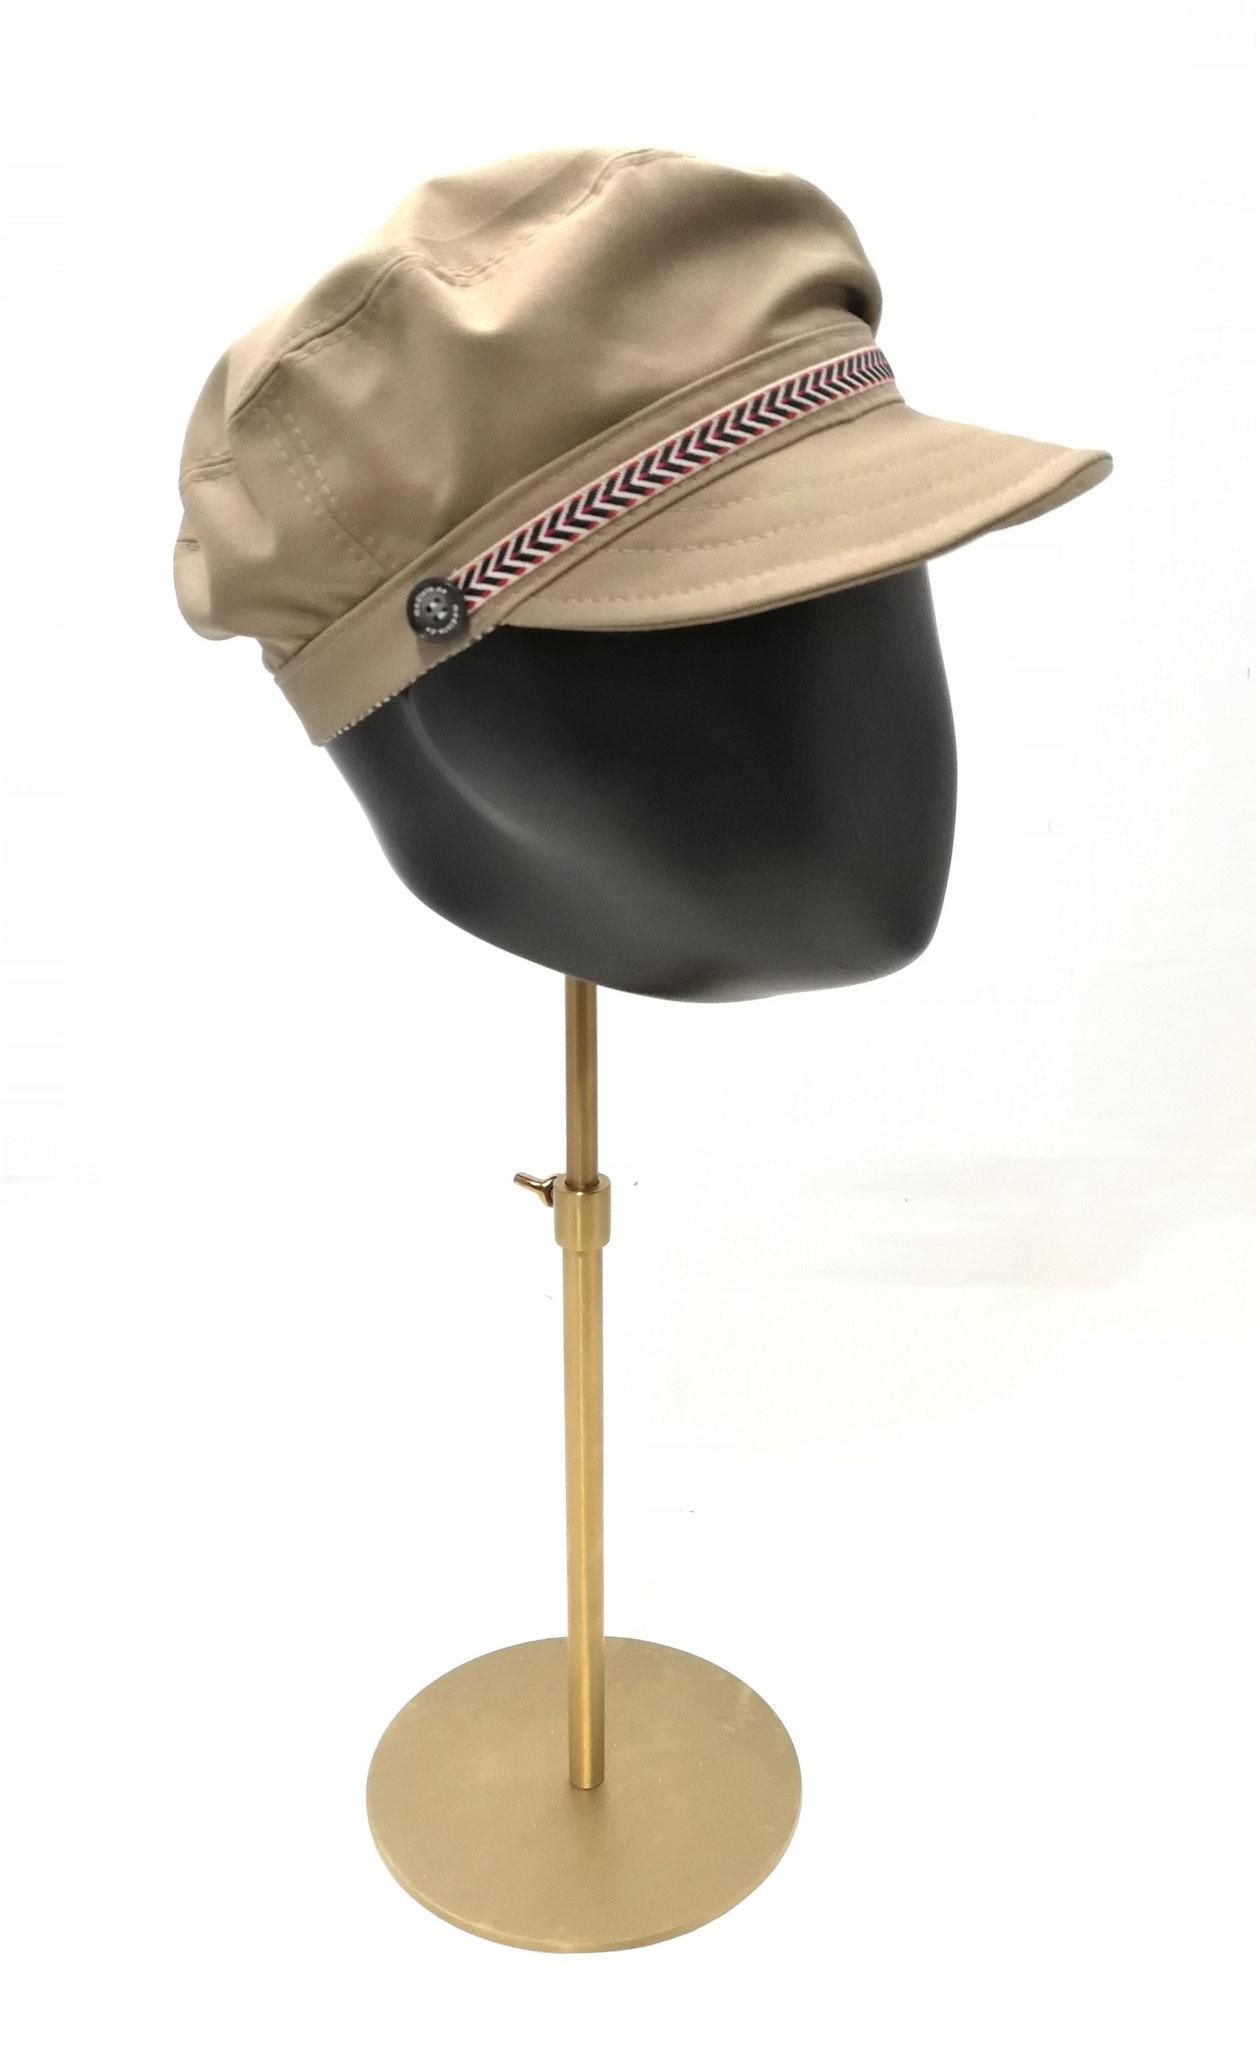 Schirm Cap, UV Stoff, khaki, Manufakturarbeit, bestellbar Preis 64,90 €